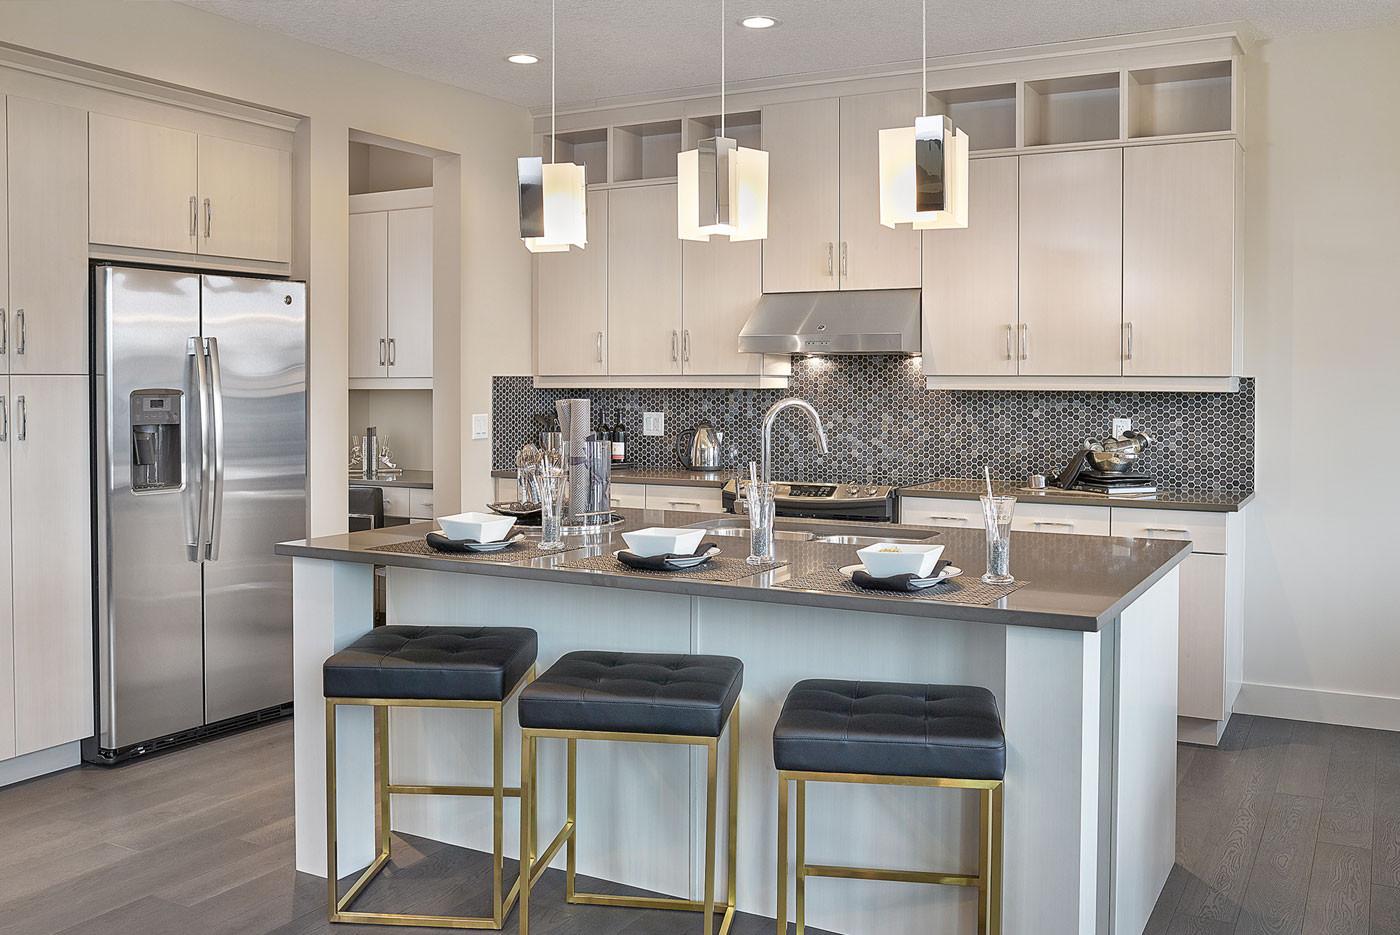 contemporary kitchen cabinet door handles Awesome Builder Homes by Avi Edmonton Designer Mirriah Cusack Finish Image